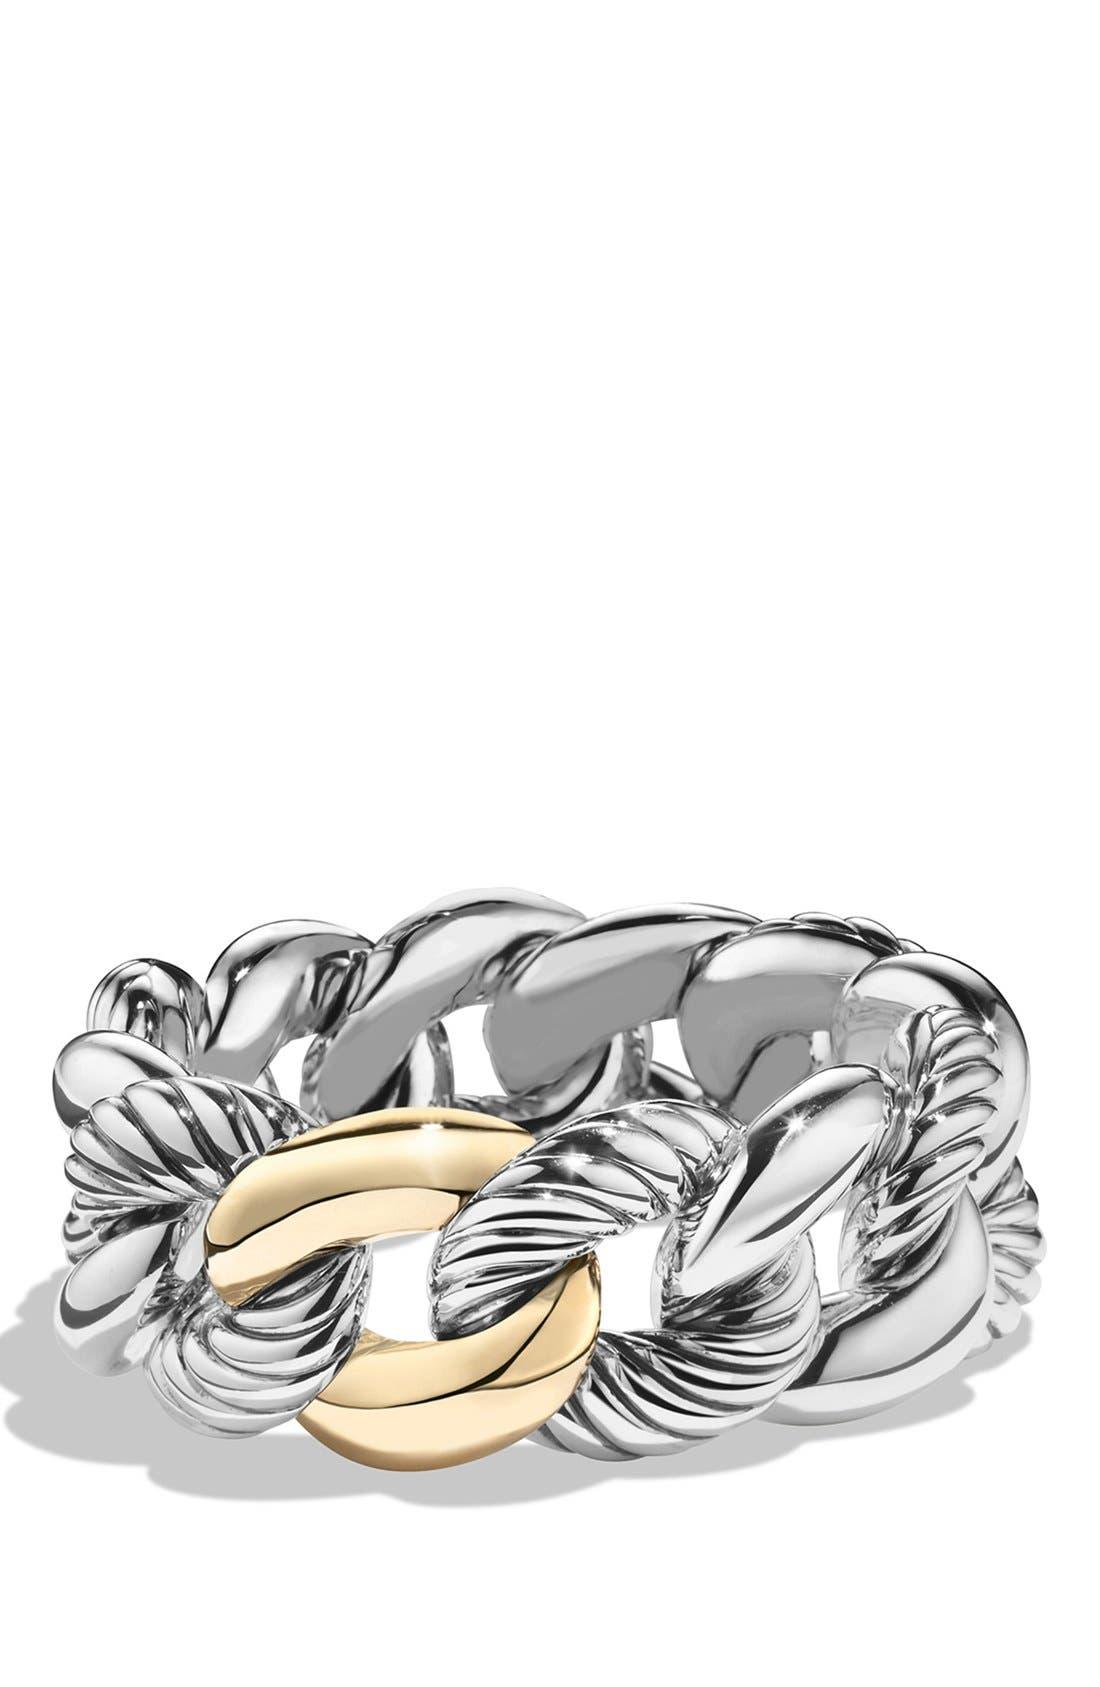 Alternate Image 1 Selected - David Yurman 'Belmont' Curb Link Bracelet with 18K Gold